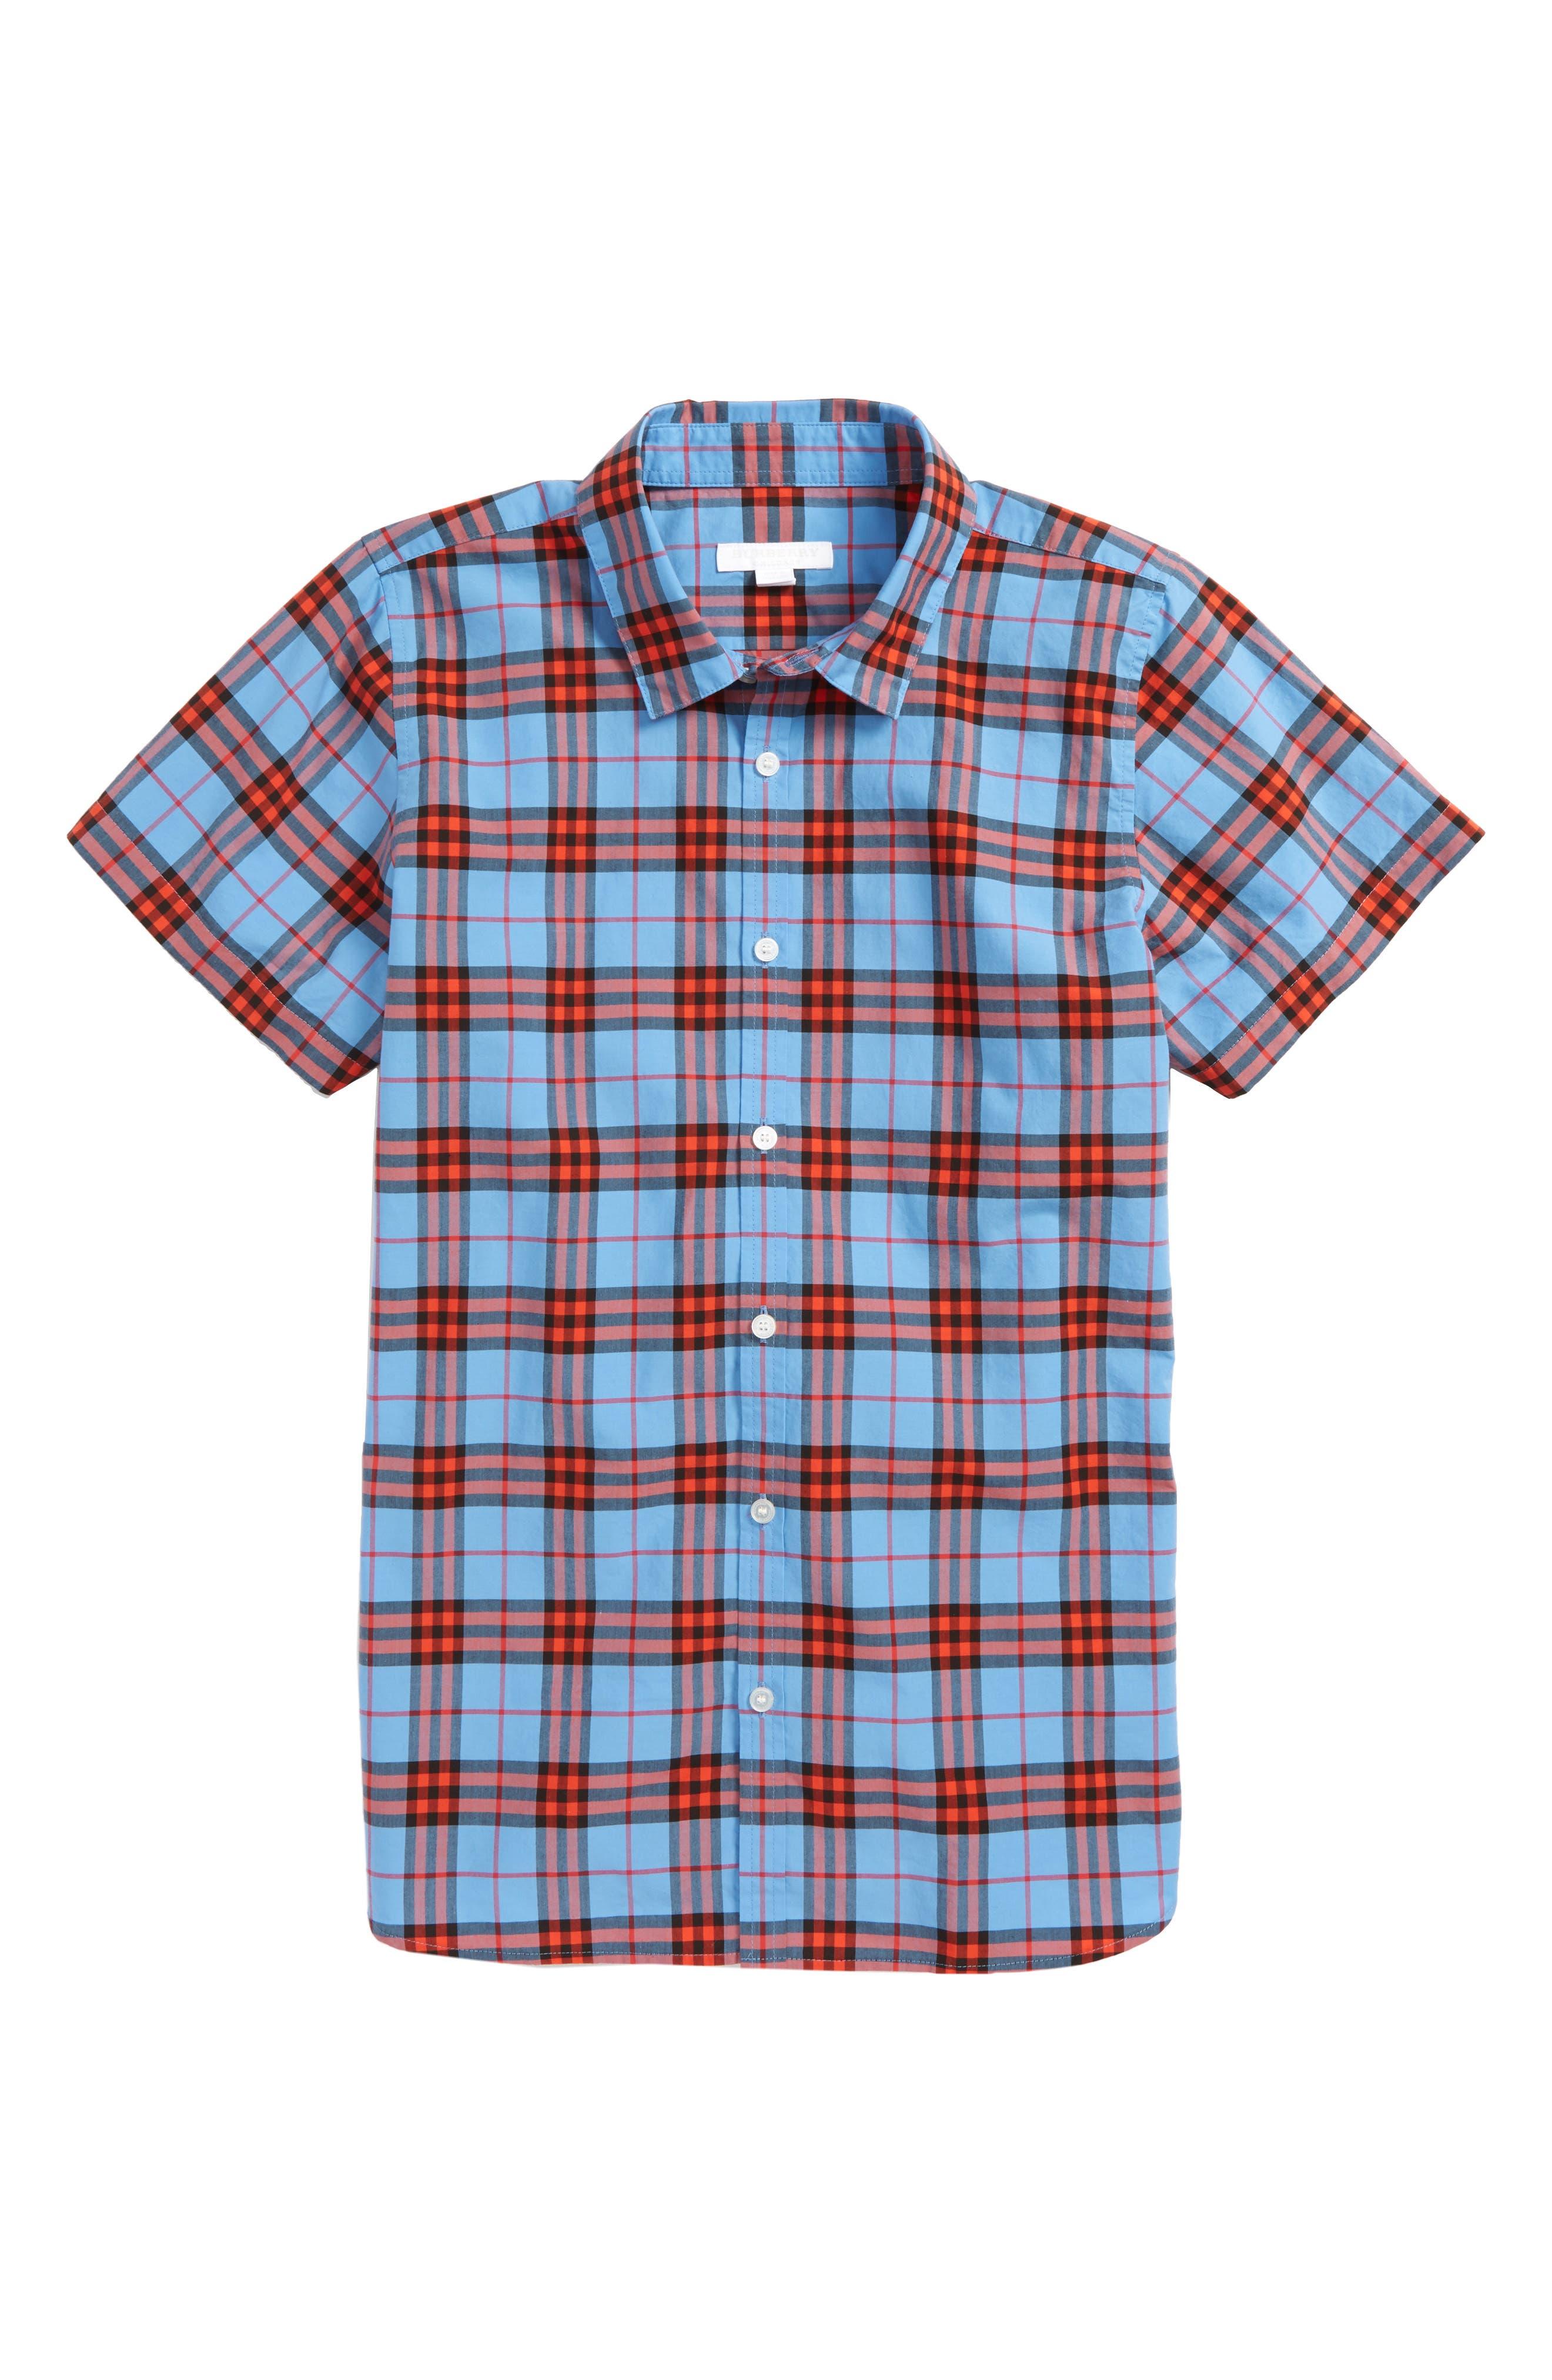 Clarkey Plaid Woven Shirt,                             Main thumbnail 1, color,                             428